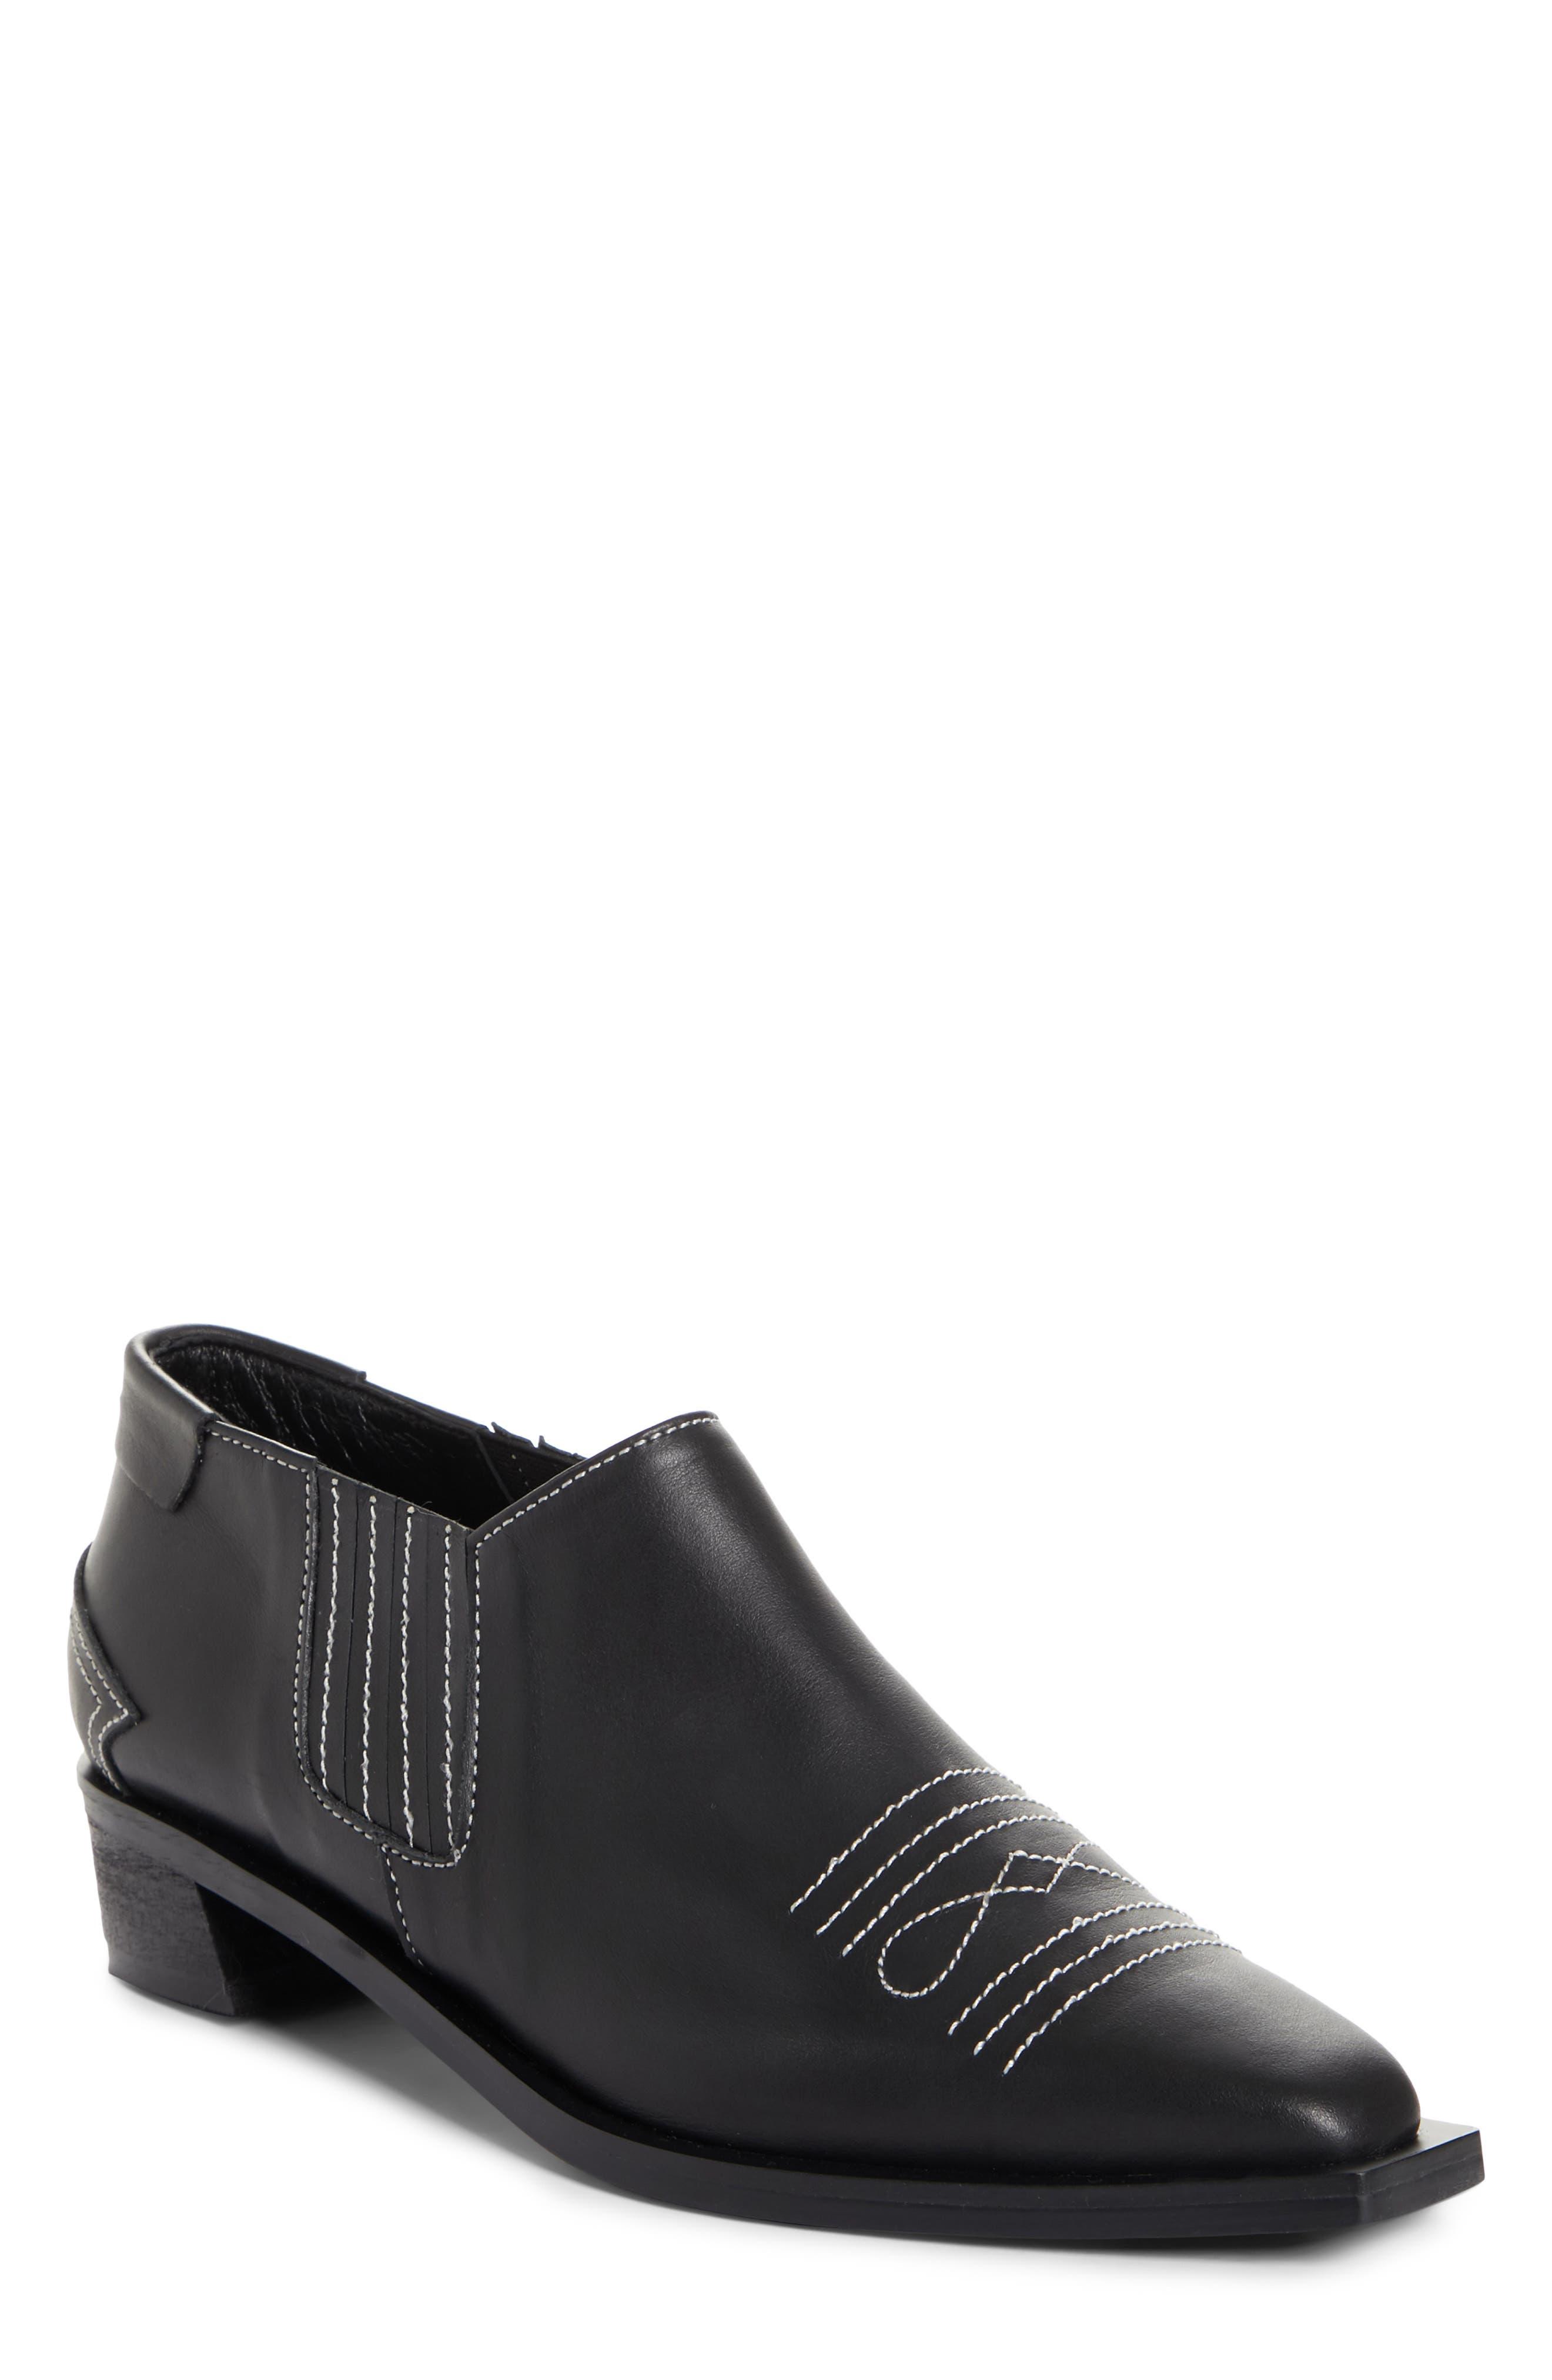 Reike Nen Western Loafer, Black